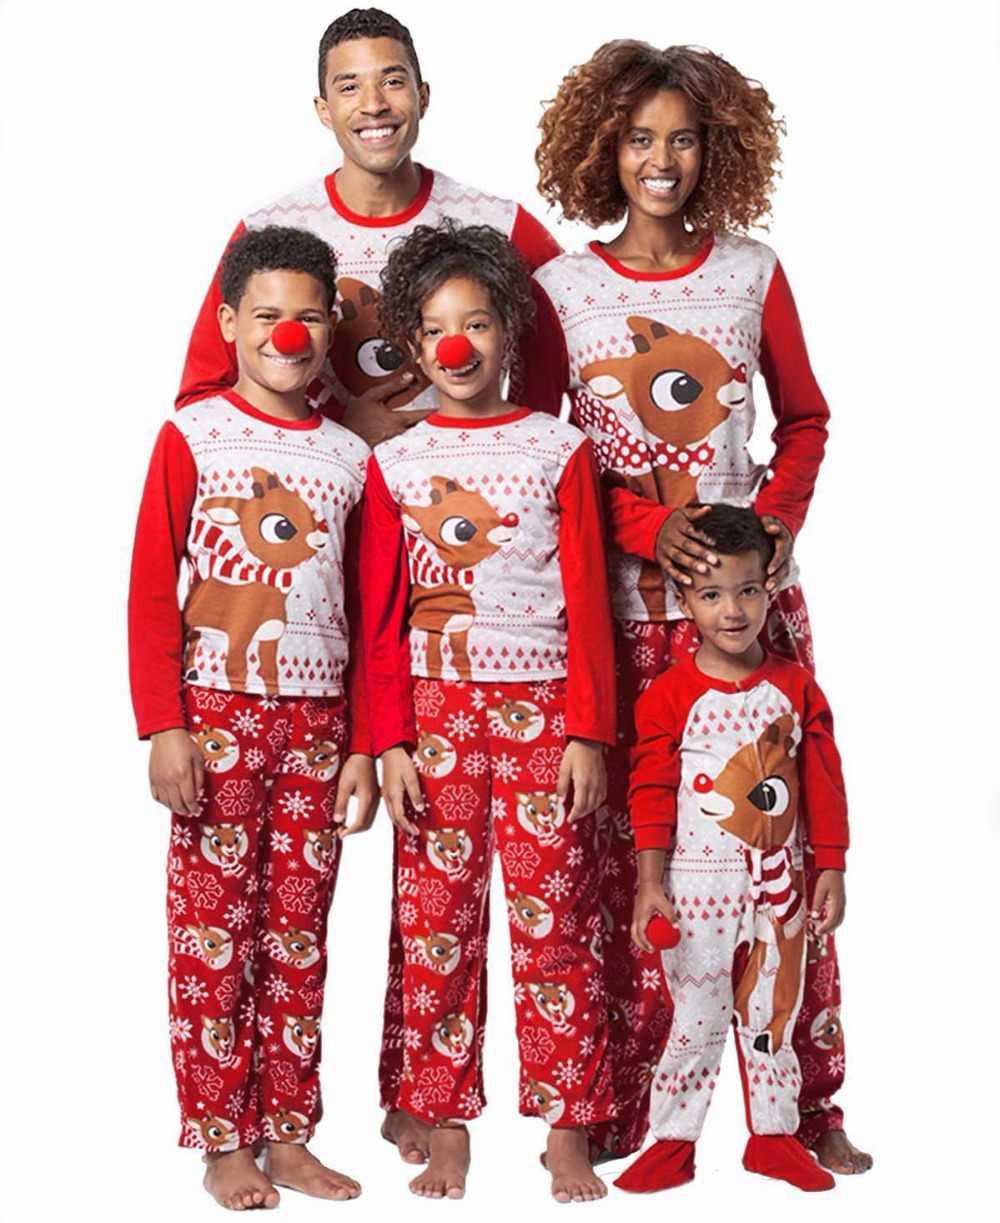 f87d440e59 Family Pajamas Set Christmas Fashion Family Matching Outfits Adult Kids Pajamas  set Nightwear Sleepwear Red Pyjamas